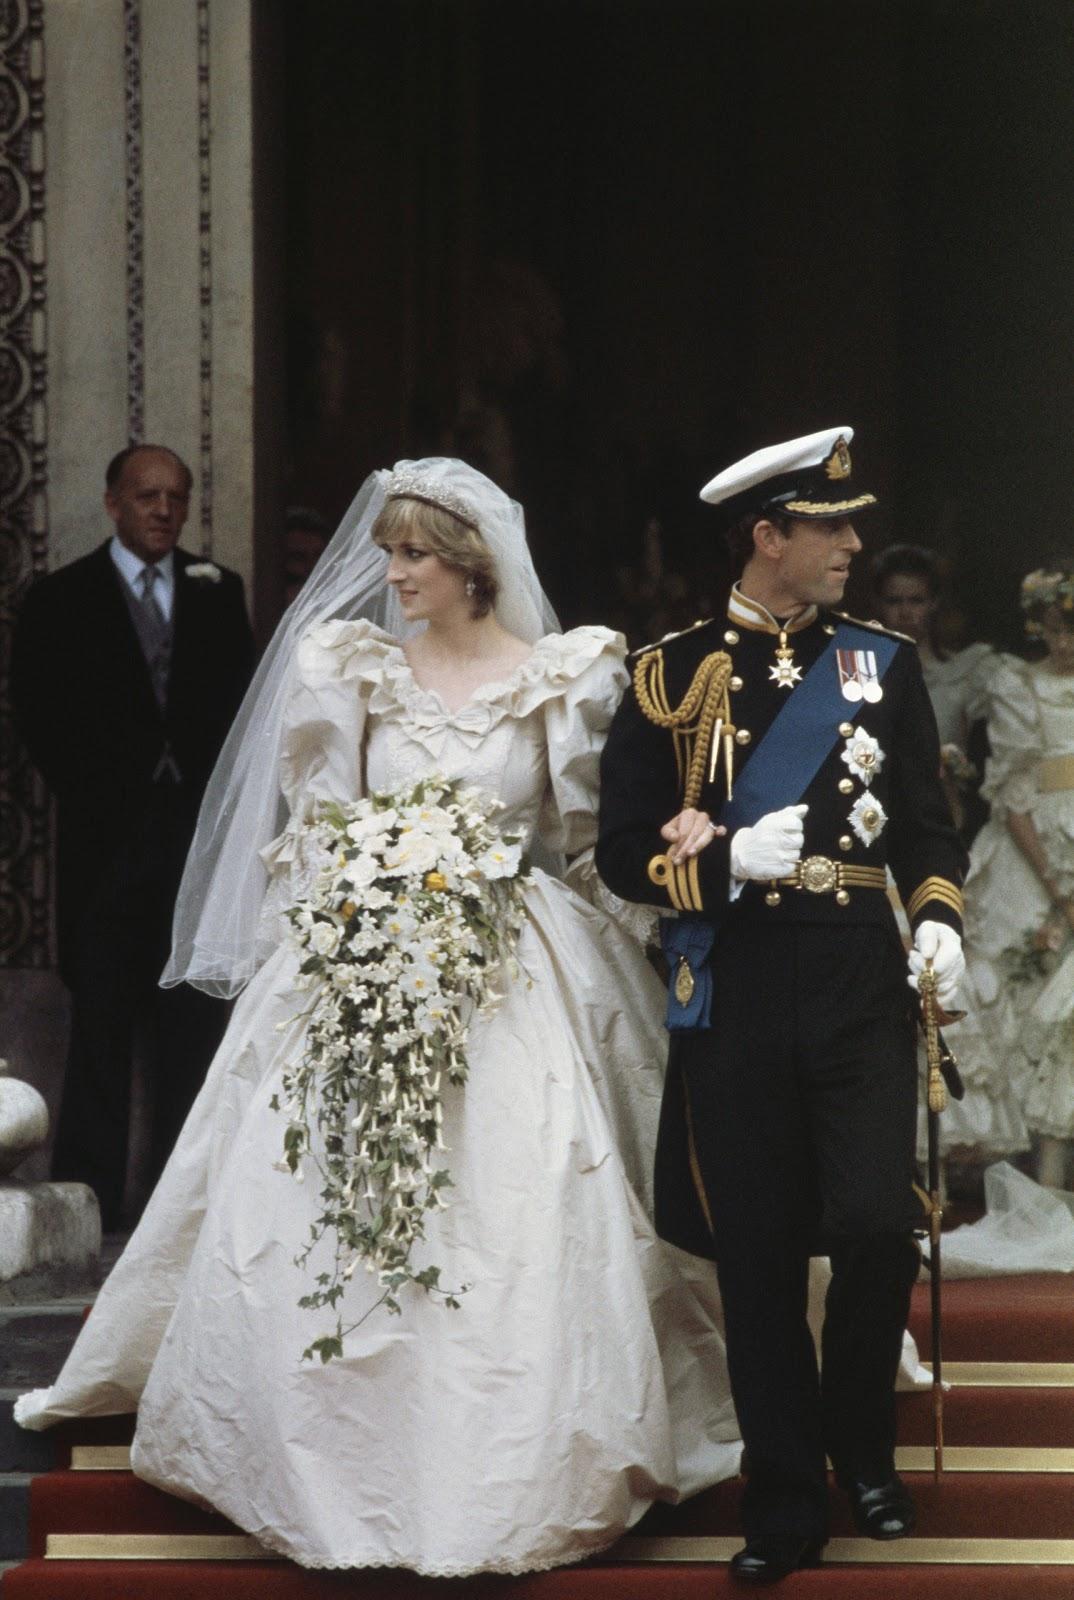 http://4.bp.blogspot.com/-CespwRMeoCk/T3vW1RsOQmI/AAAAAAAAJPM/Nyr2iAu0Clg/s1600/1981-Diana-Charles-wedding-109326934.jpg